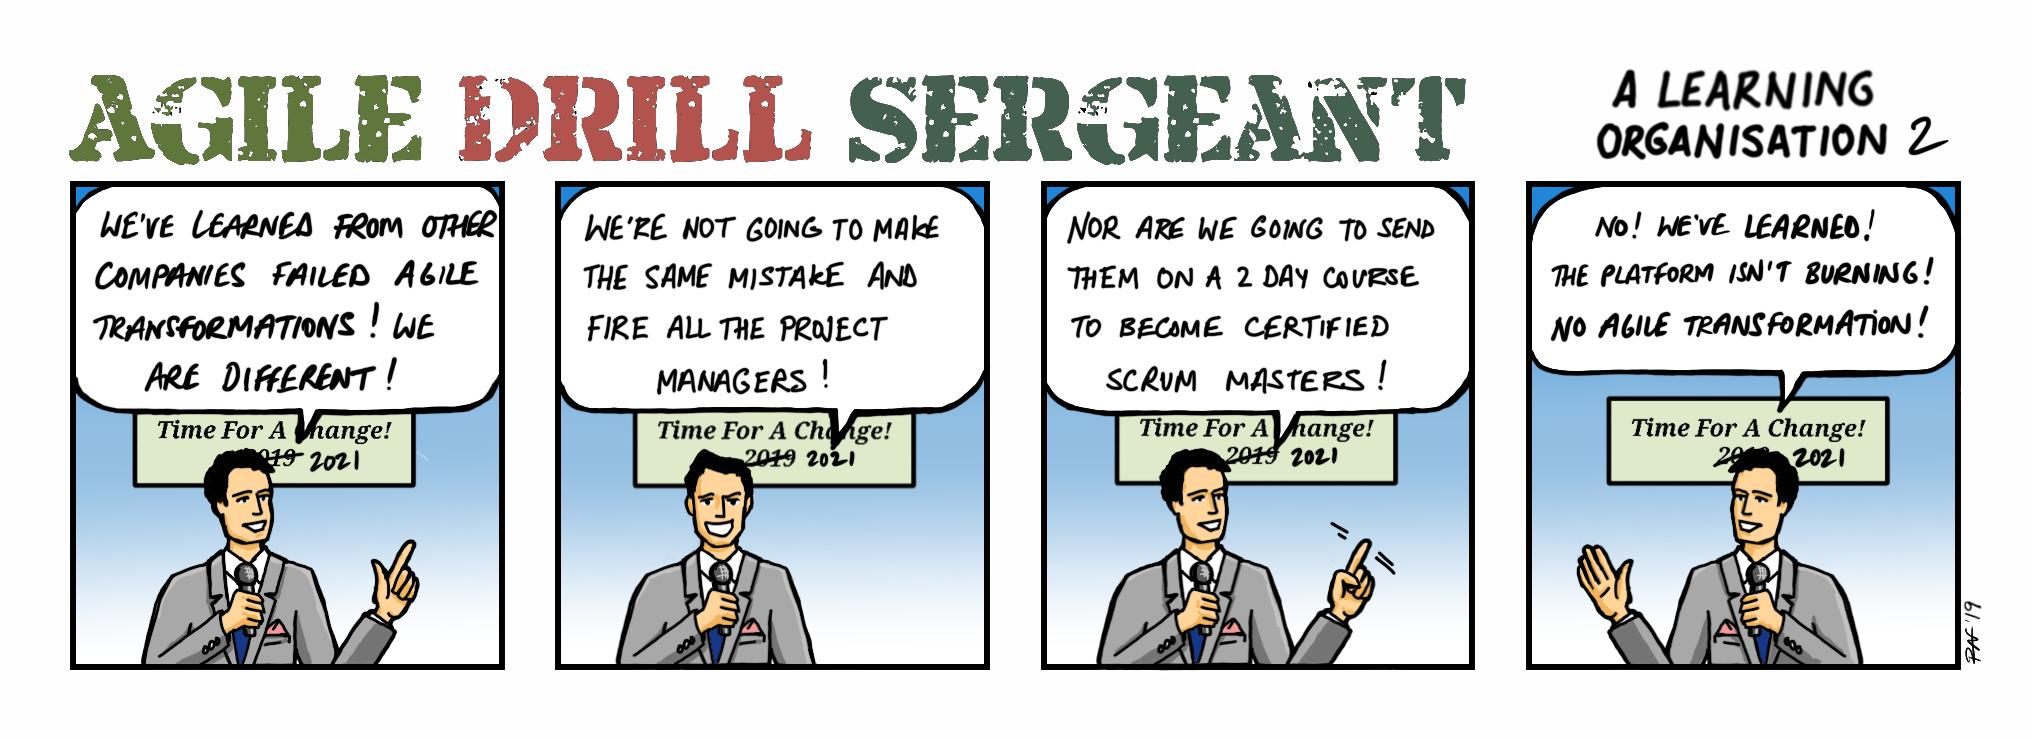 A Learning Organization 2